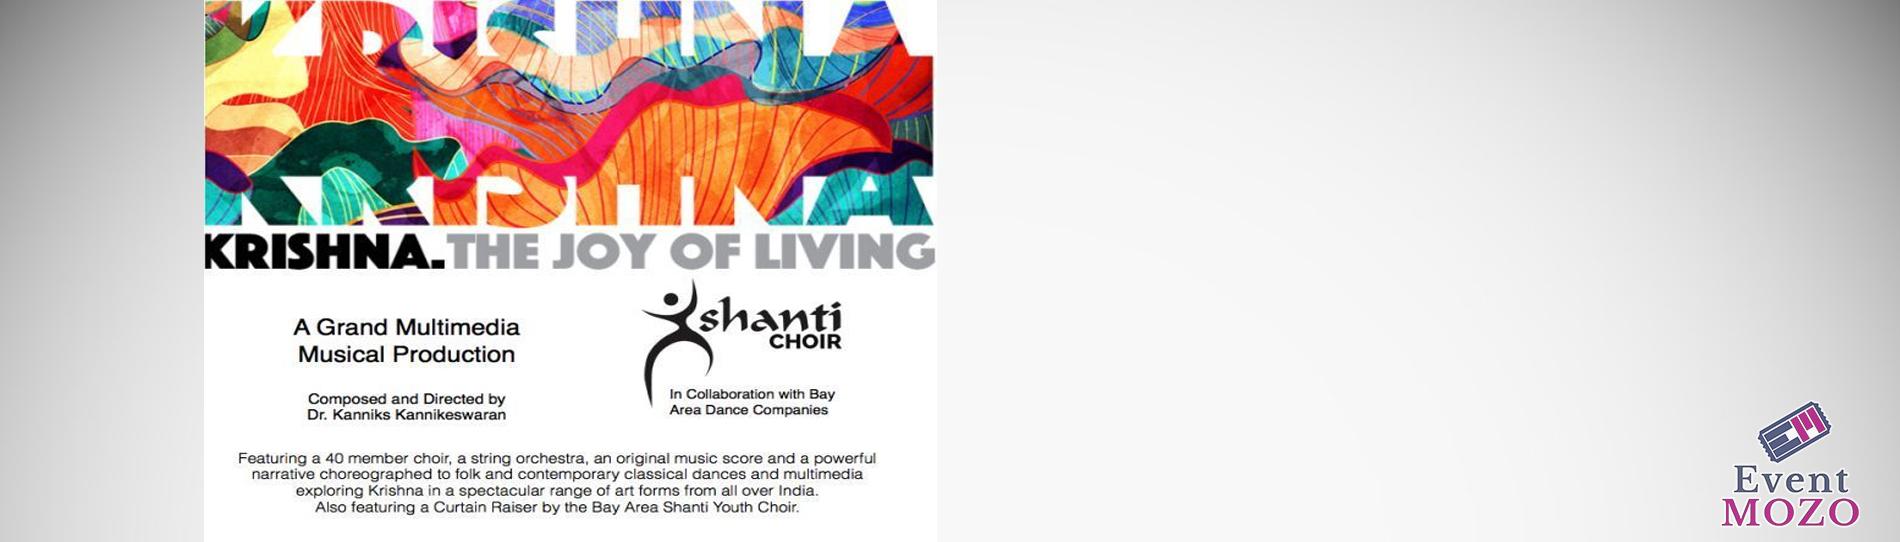 EventMozo Krishna The Joy of Living - a Grand Multimedia Musical Production